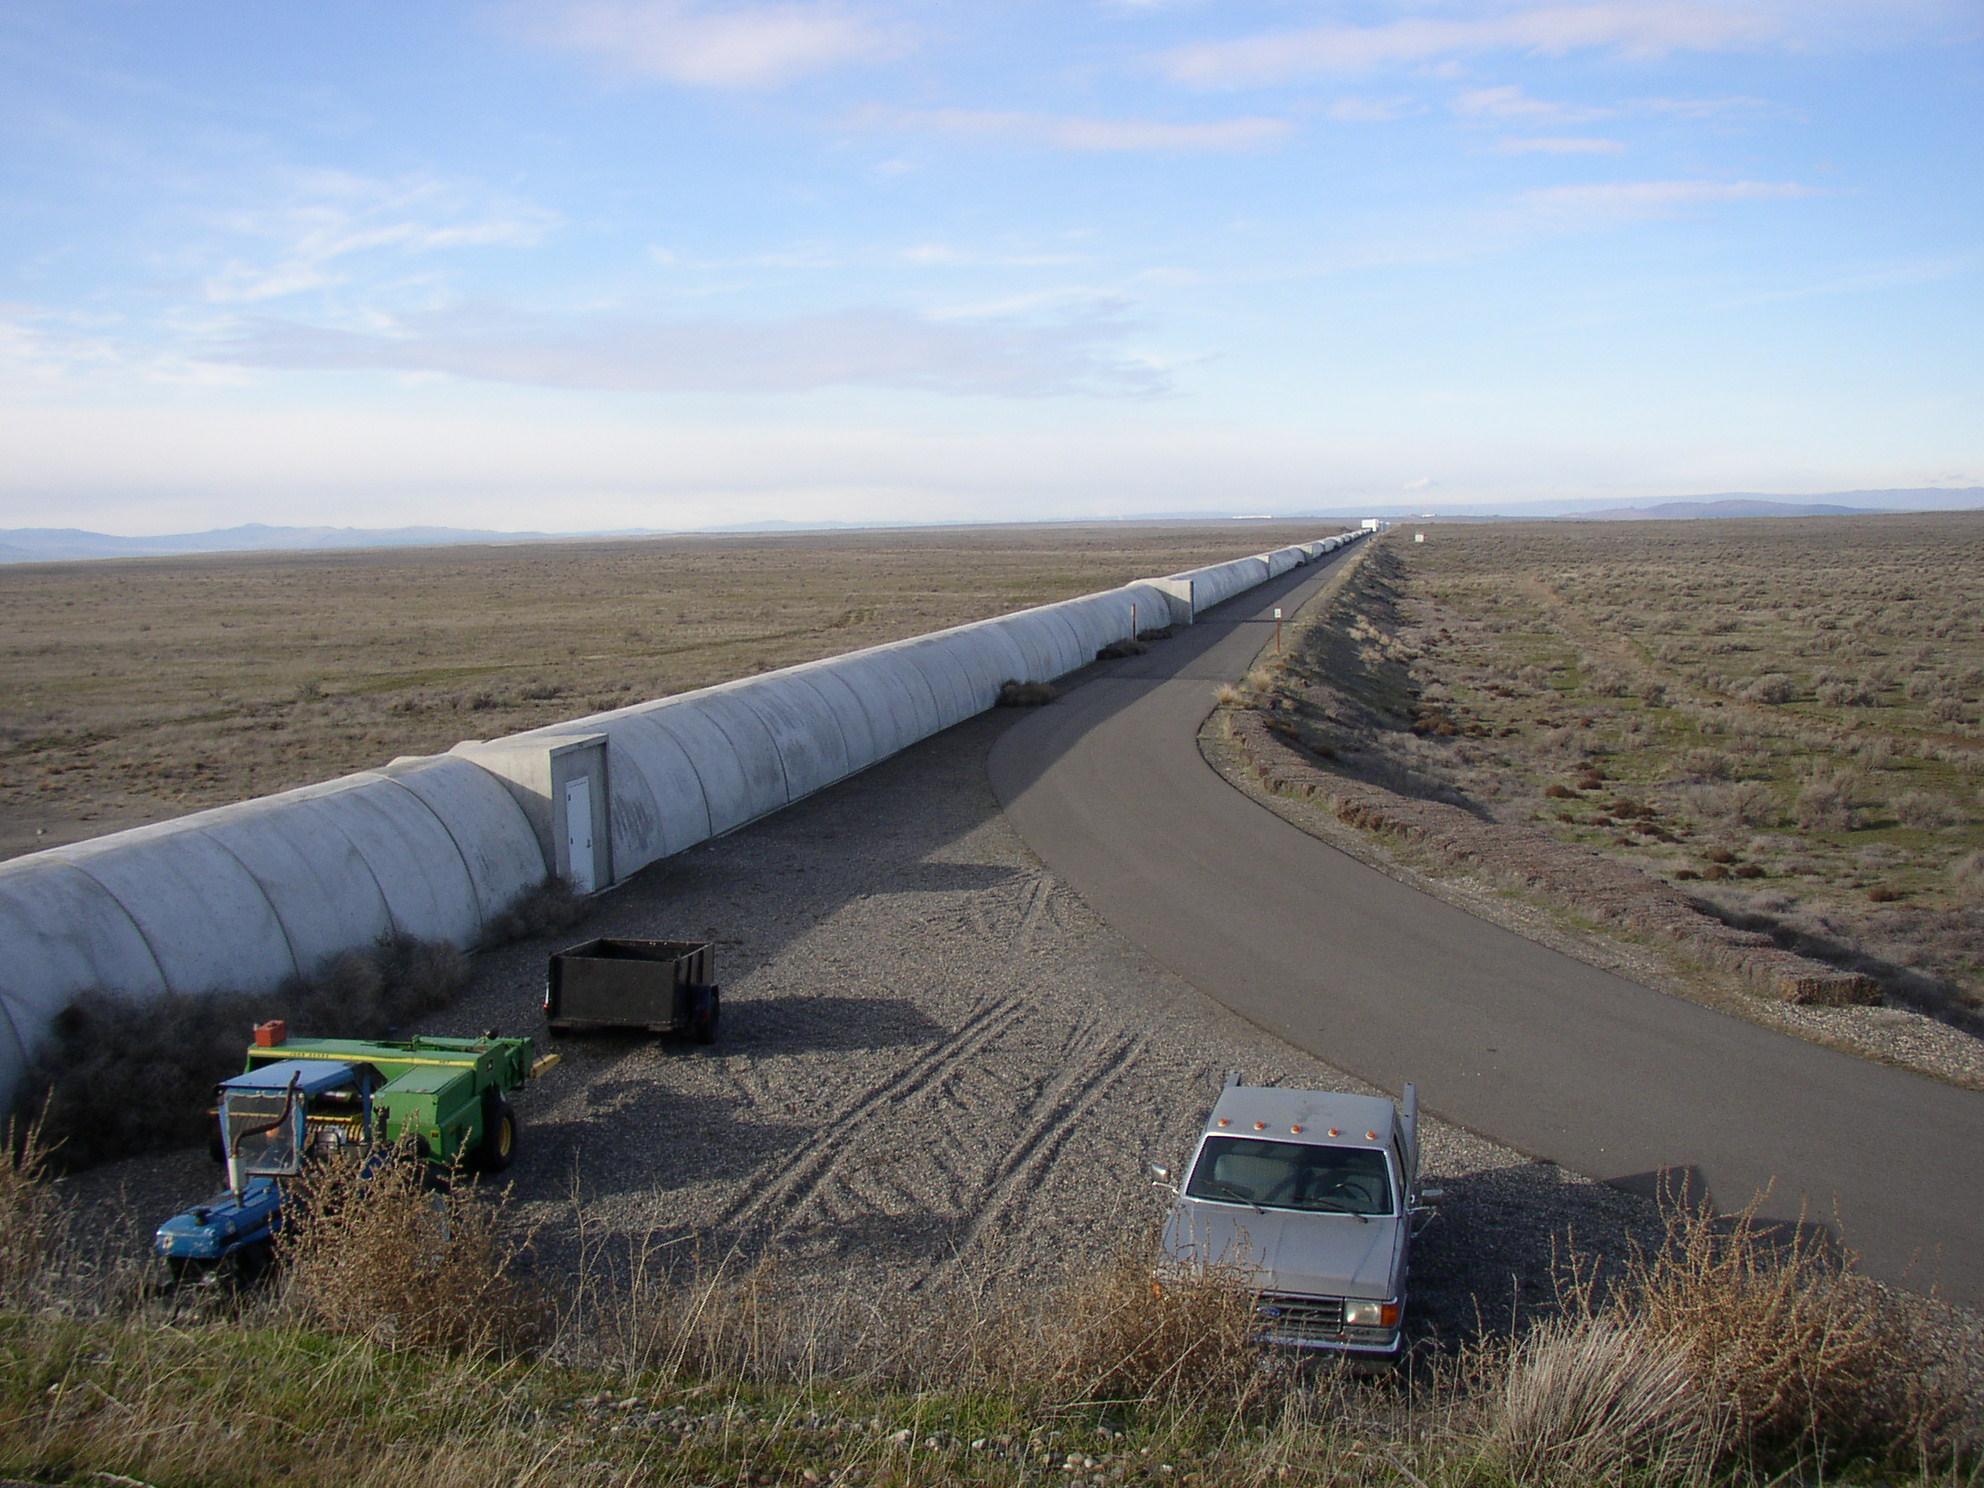 https://upload.wikimedia.org/wikipedia/commons/4/43/Northern_leg_of_LIGO_interferometer_on_Hanford_Reservation.JPG